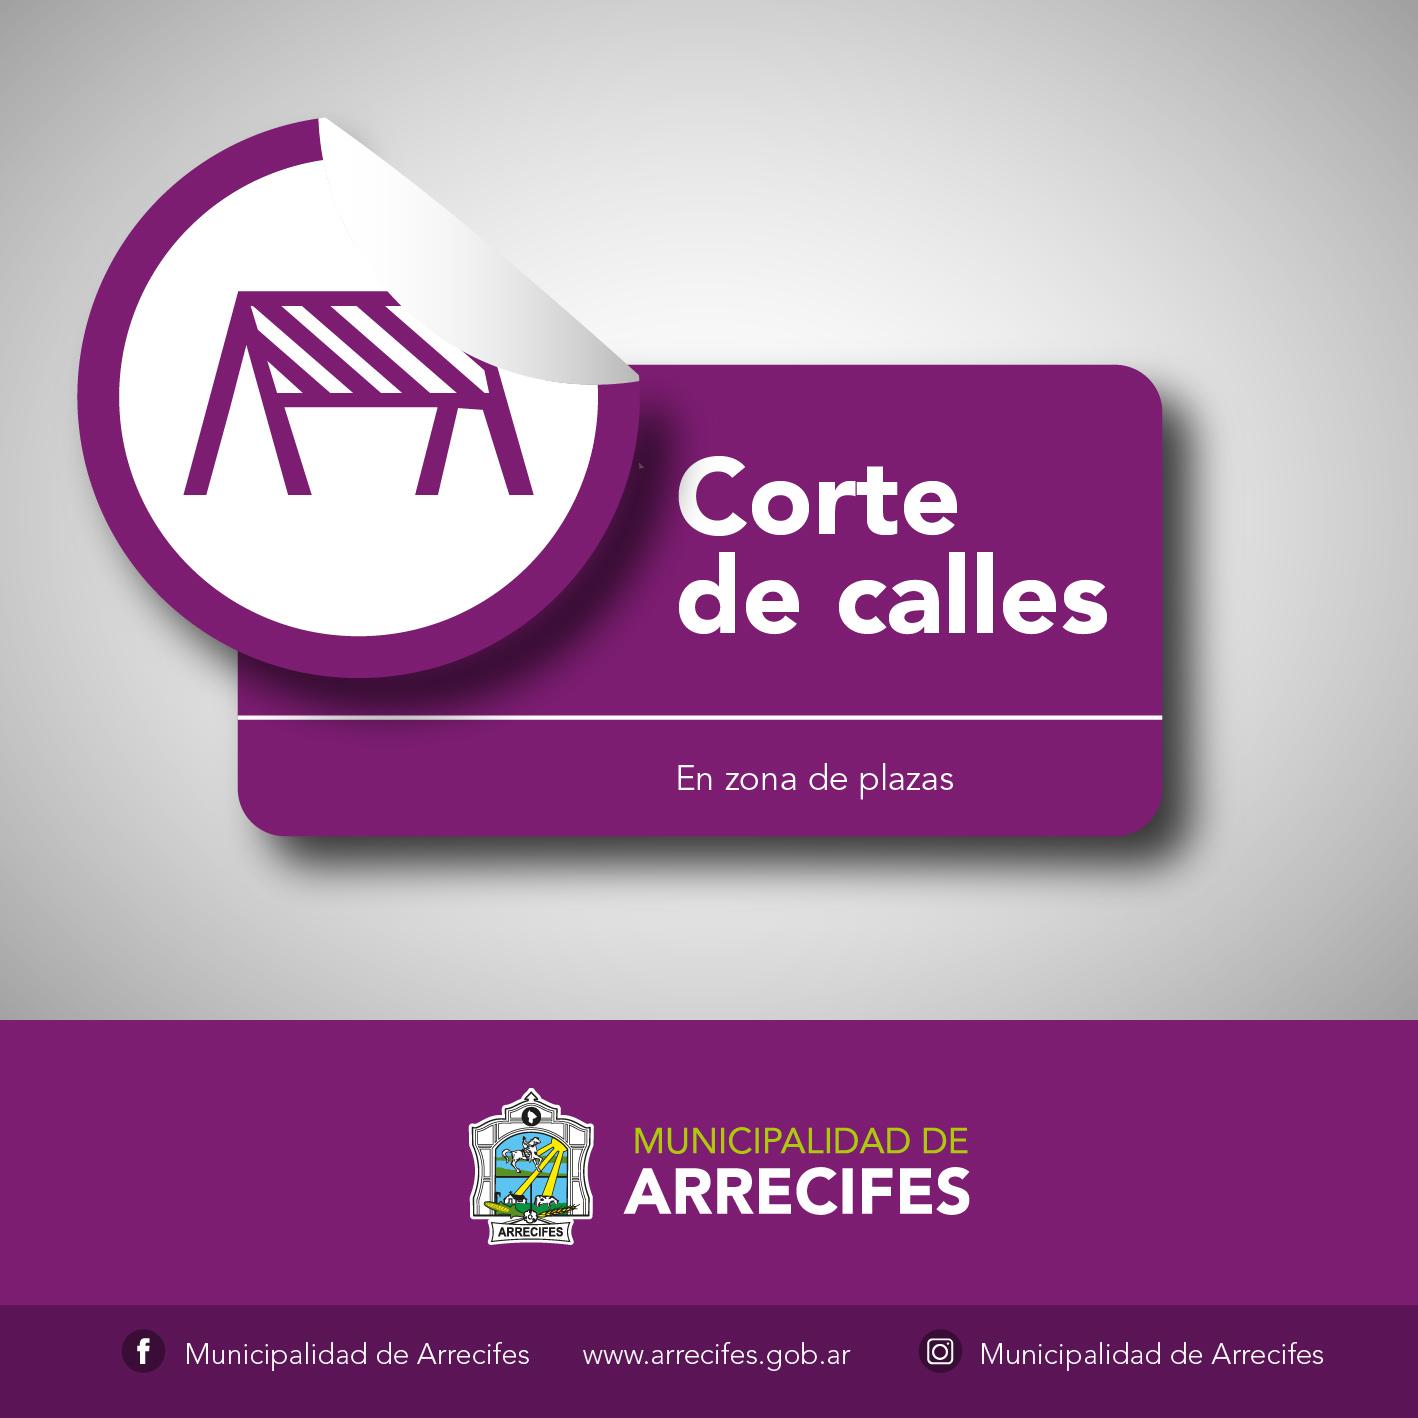 CORTE DE CALLES EN ZONA DE PLAZAS